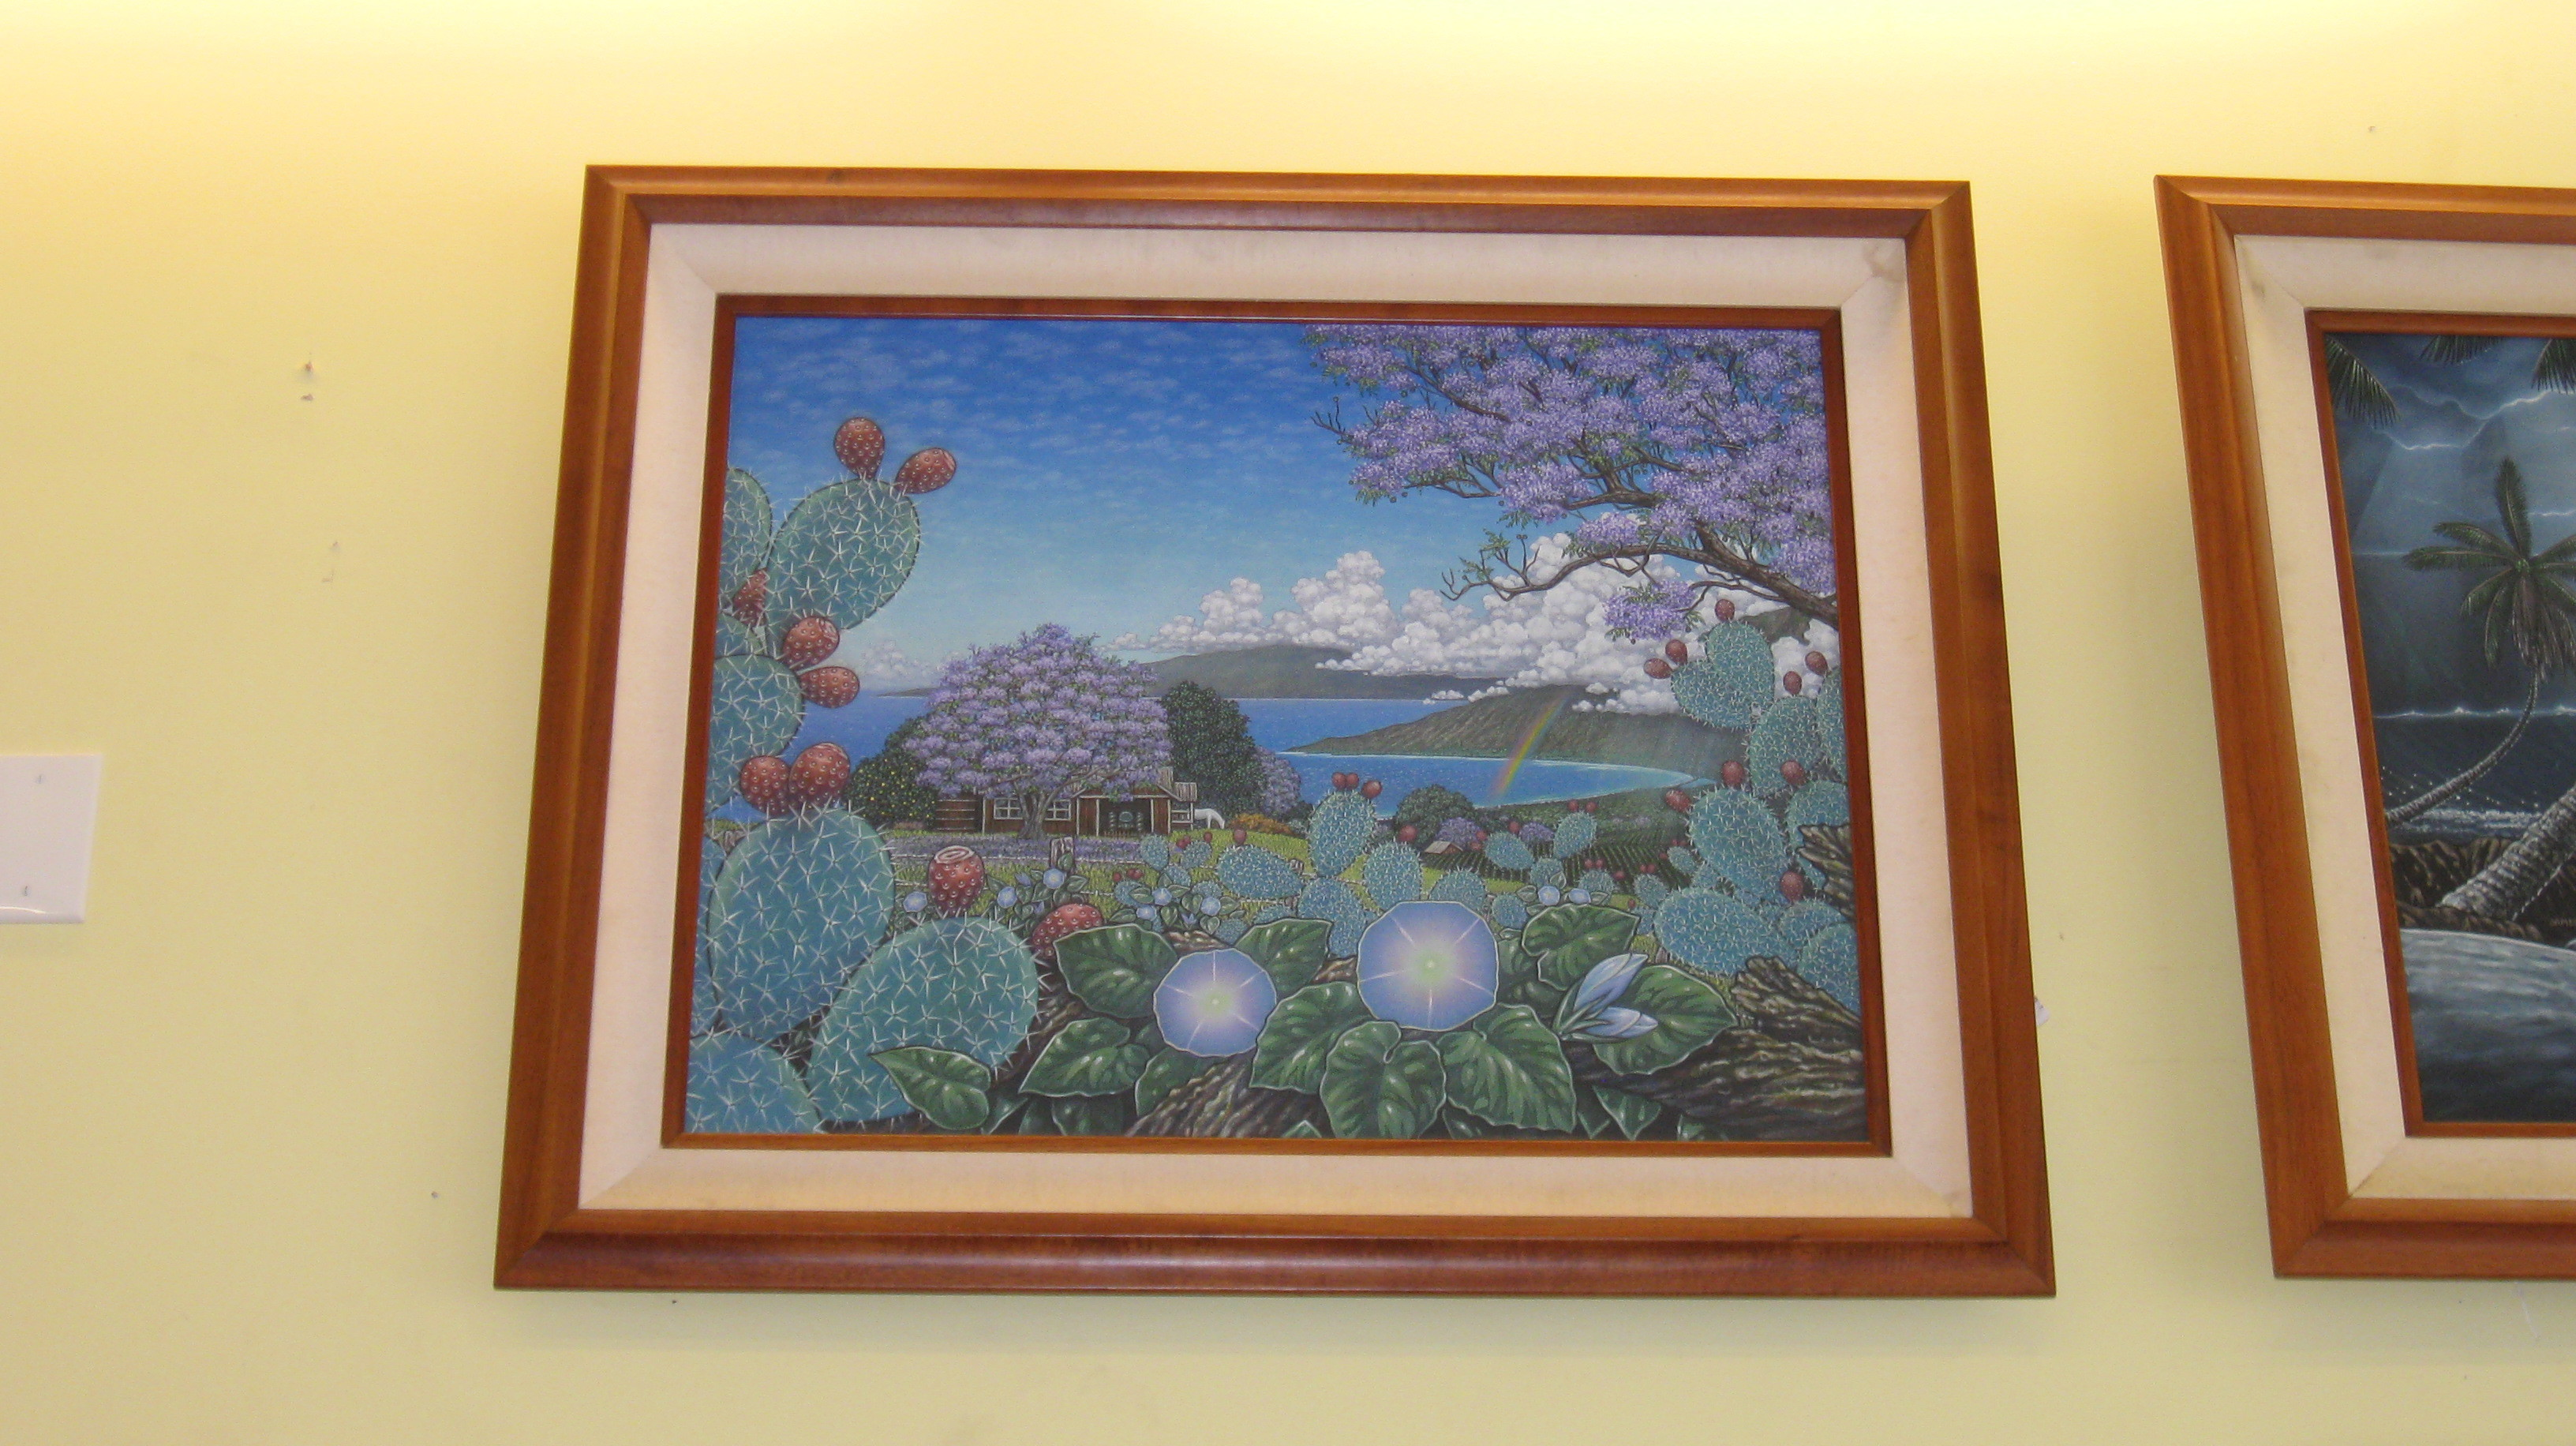 Upcountry Ocean View James Fields Painting - Koa Frame 34